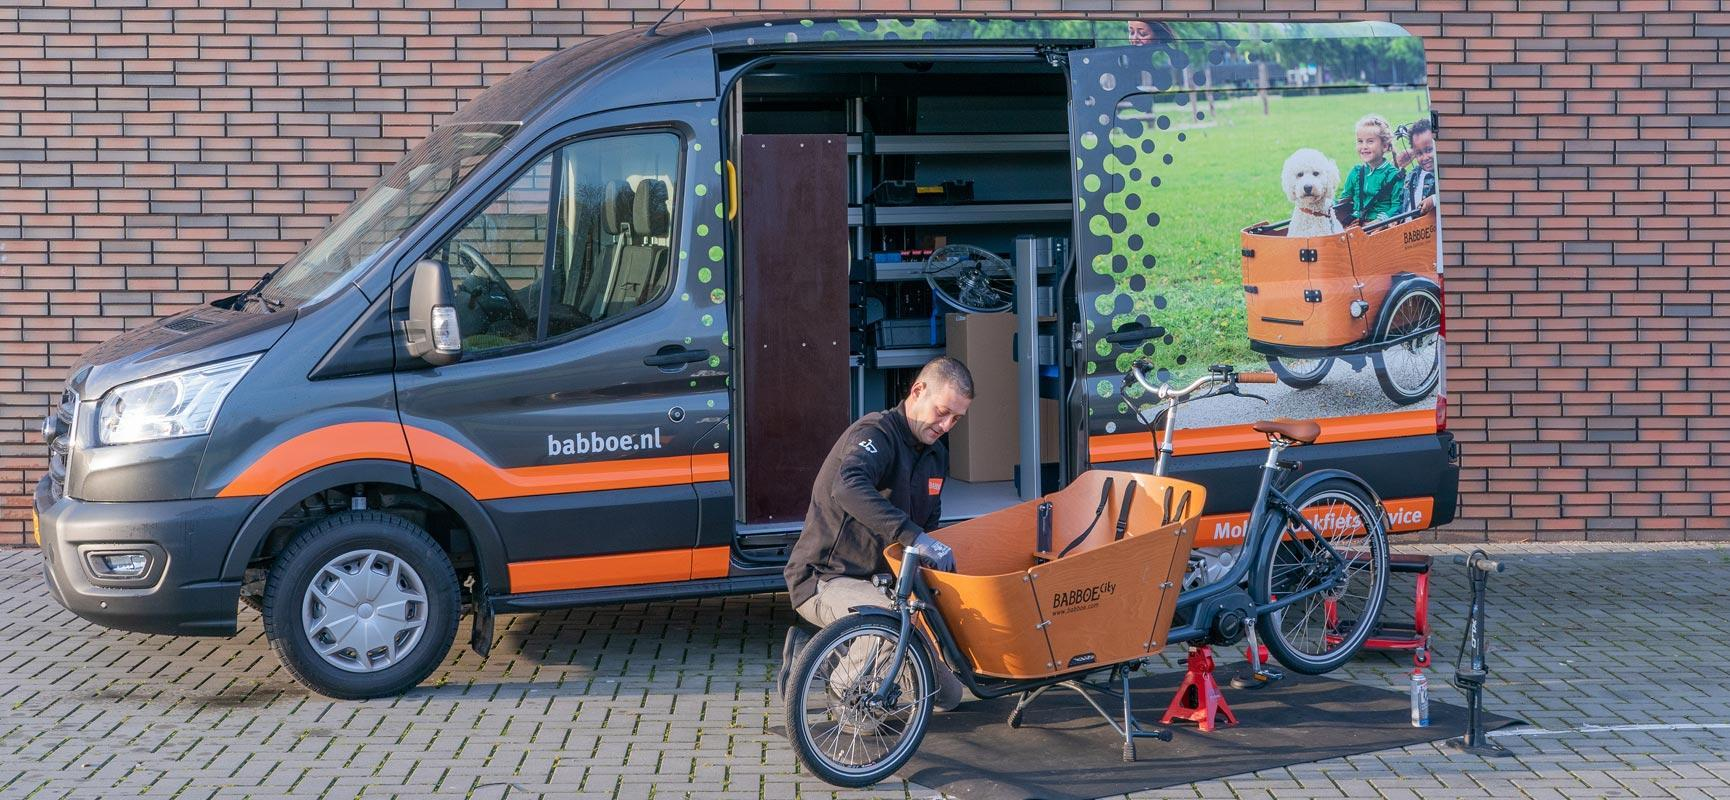 Lastenfahrrad Pflegetipps | dein Lastenrad in Toppform